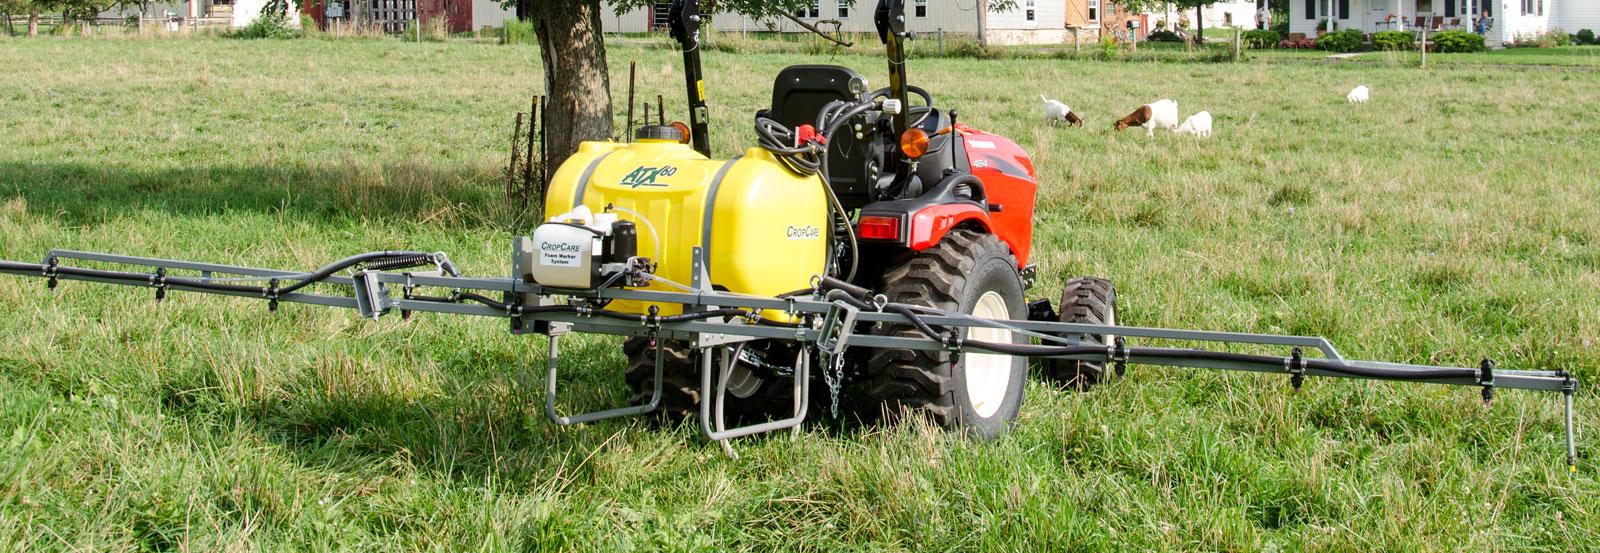 Cropcare Atv Sprayers Wiring Harness For Sprayer